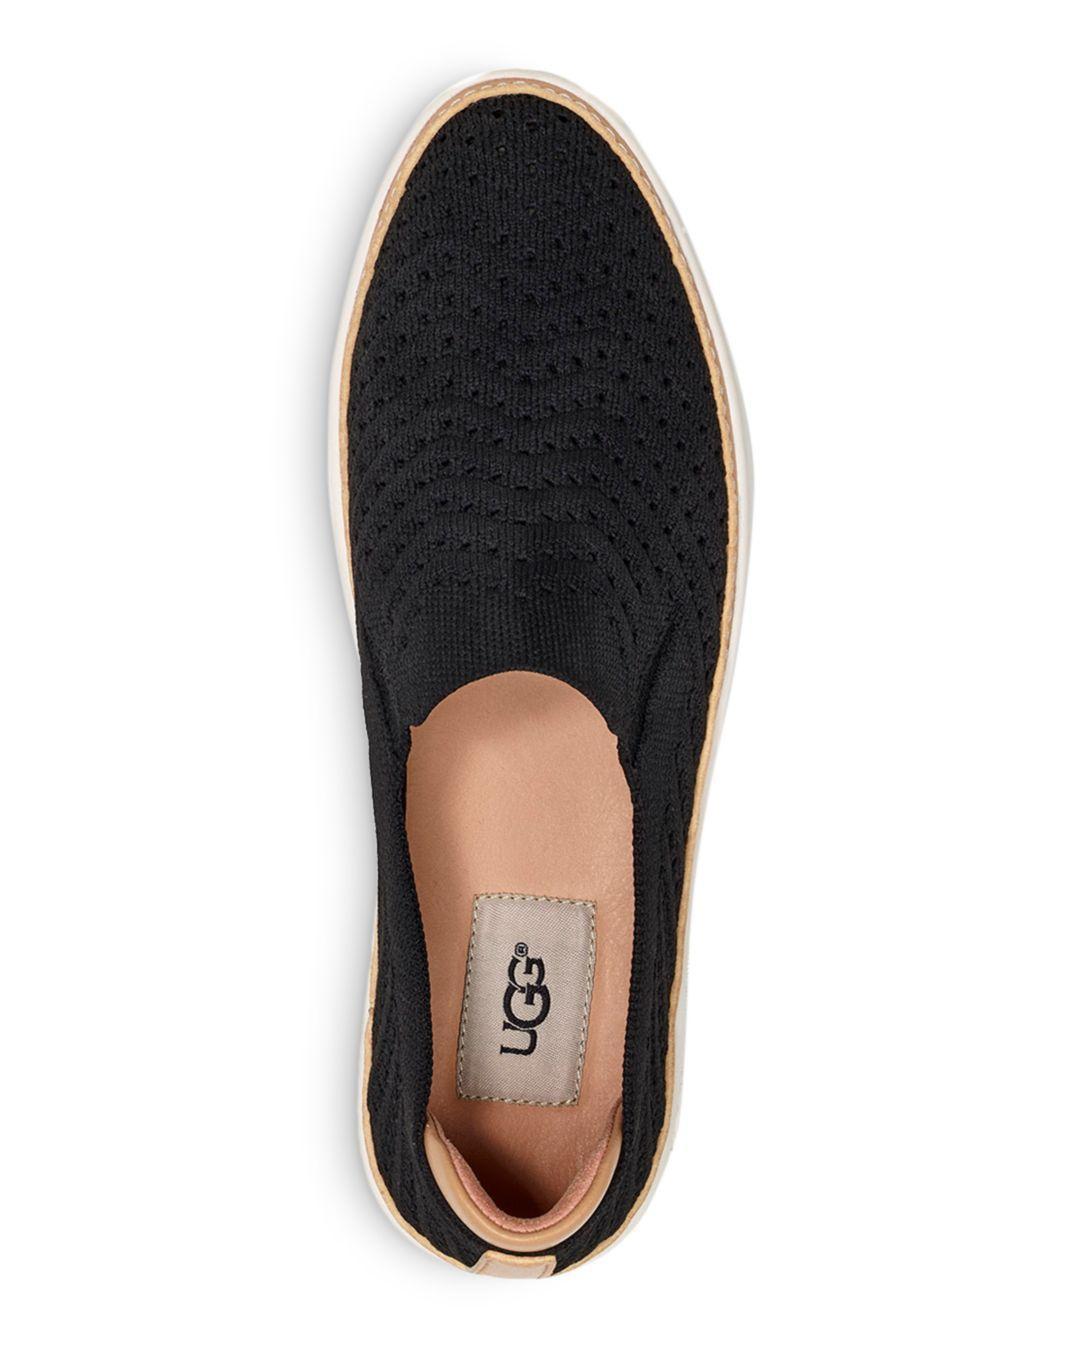 7cb4156b9c9 Women's Sammy Chevron Knit Slip - On Sneakers